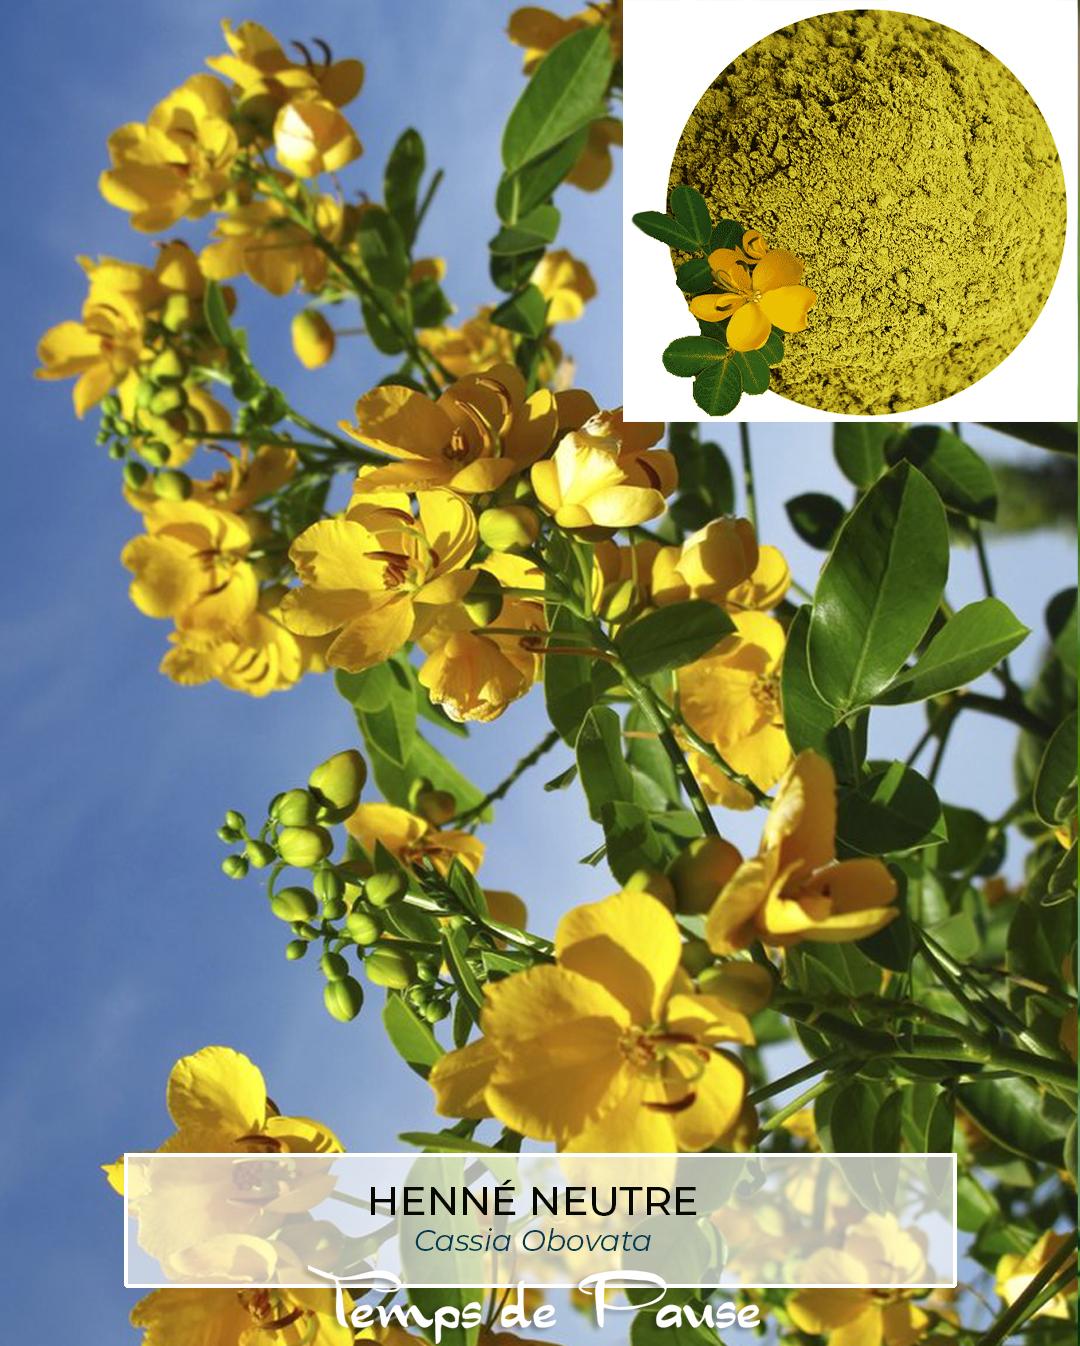 Henné neutre-Cassia Obovata